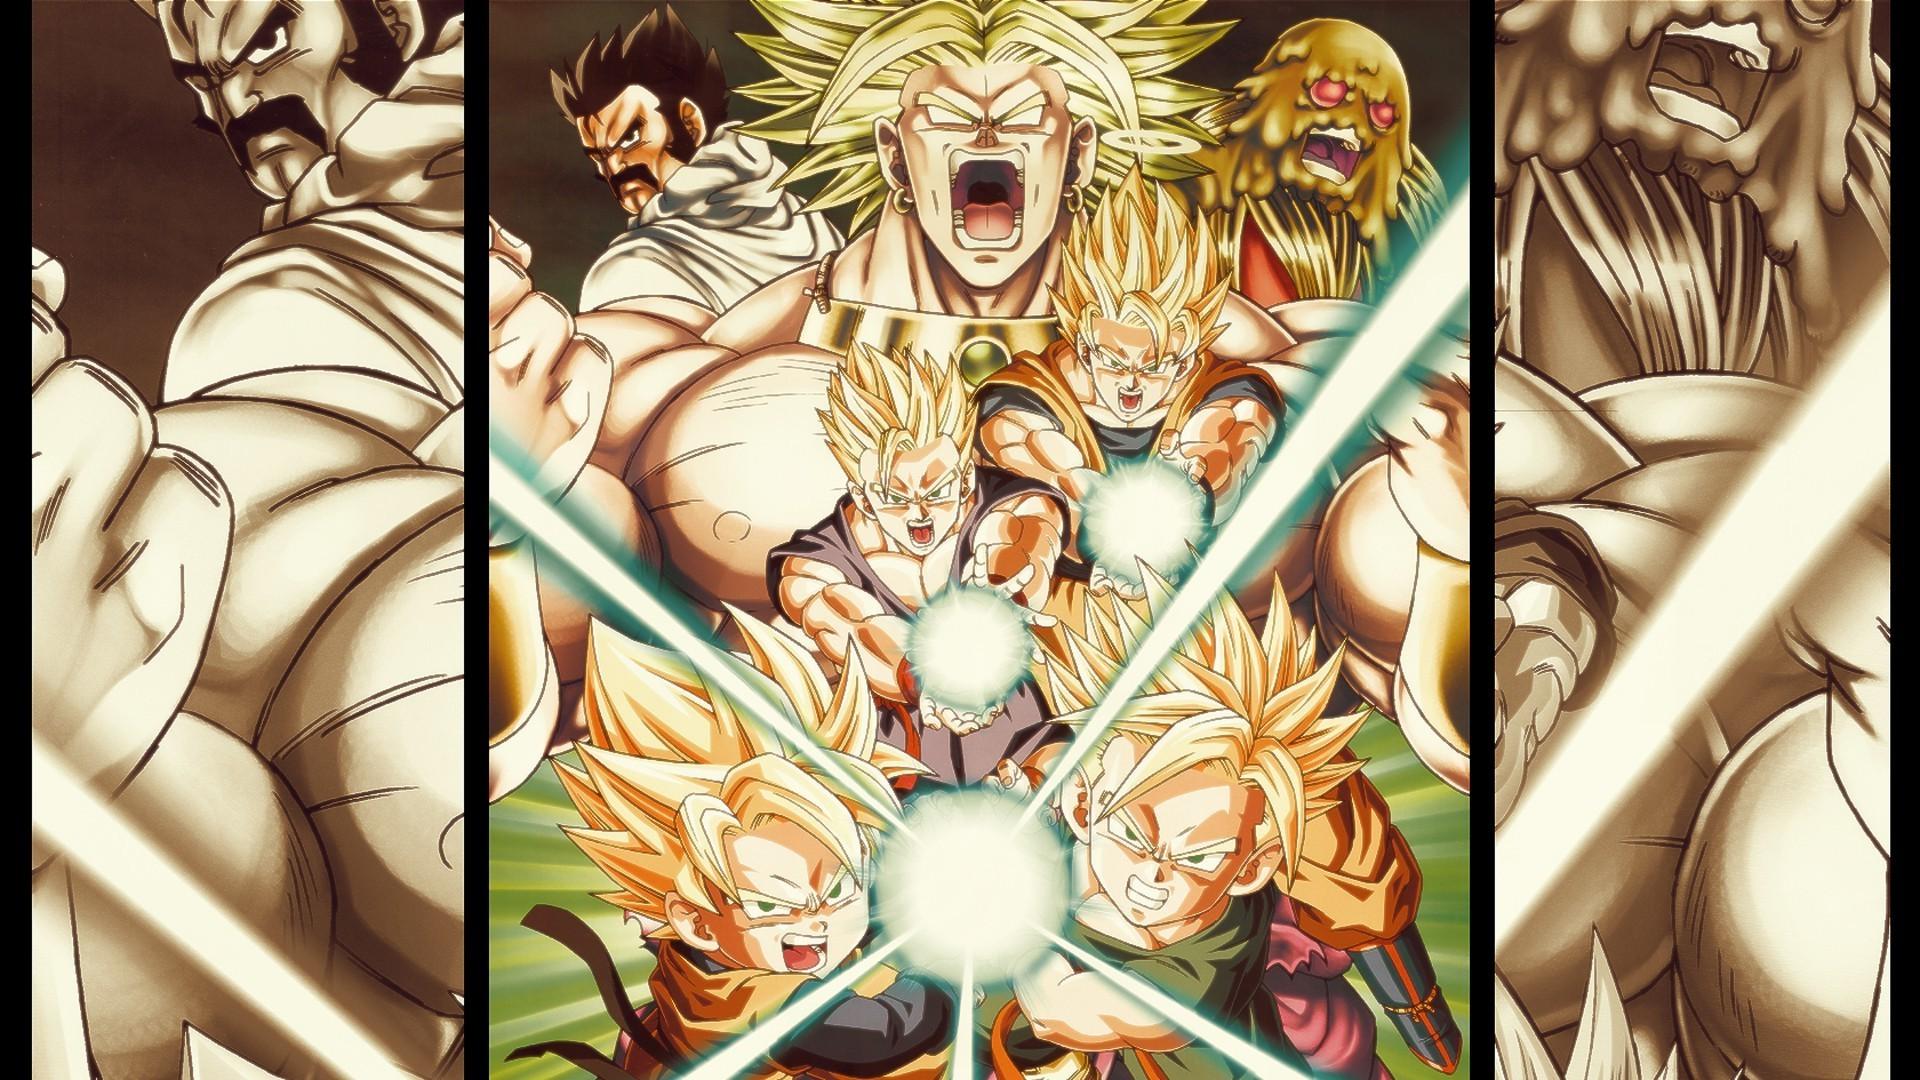 Illustration Anime Dragon Ball Gohan Comics Mythology Trunks Character Kamehameha Son Goten Broly 1920x1080 Px Comic